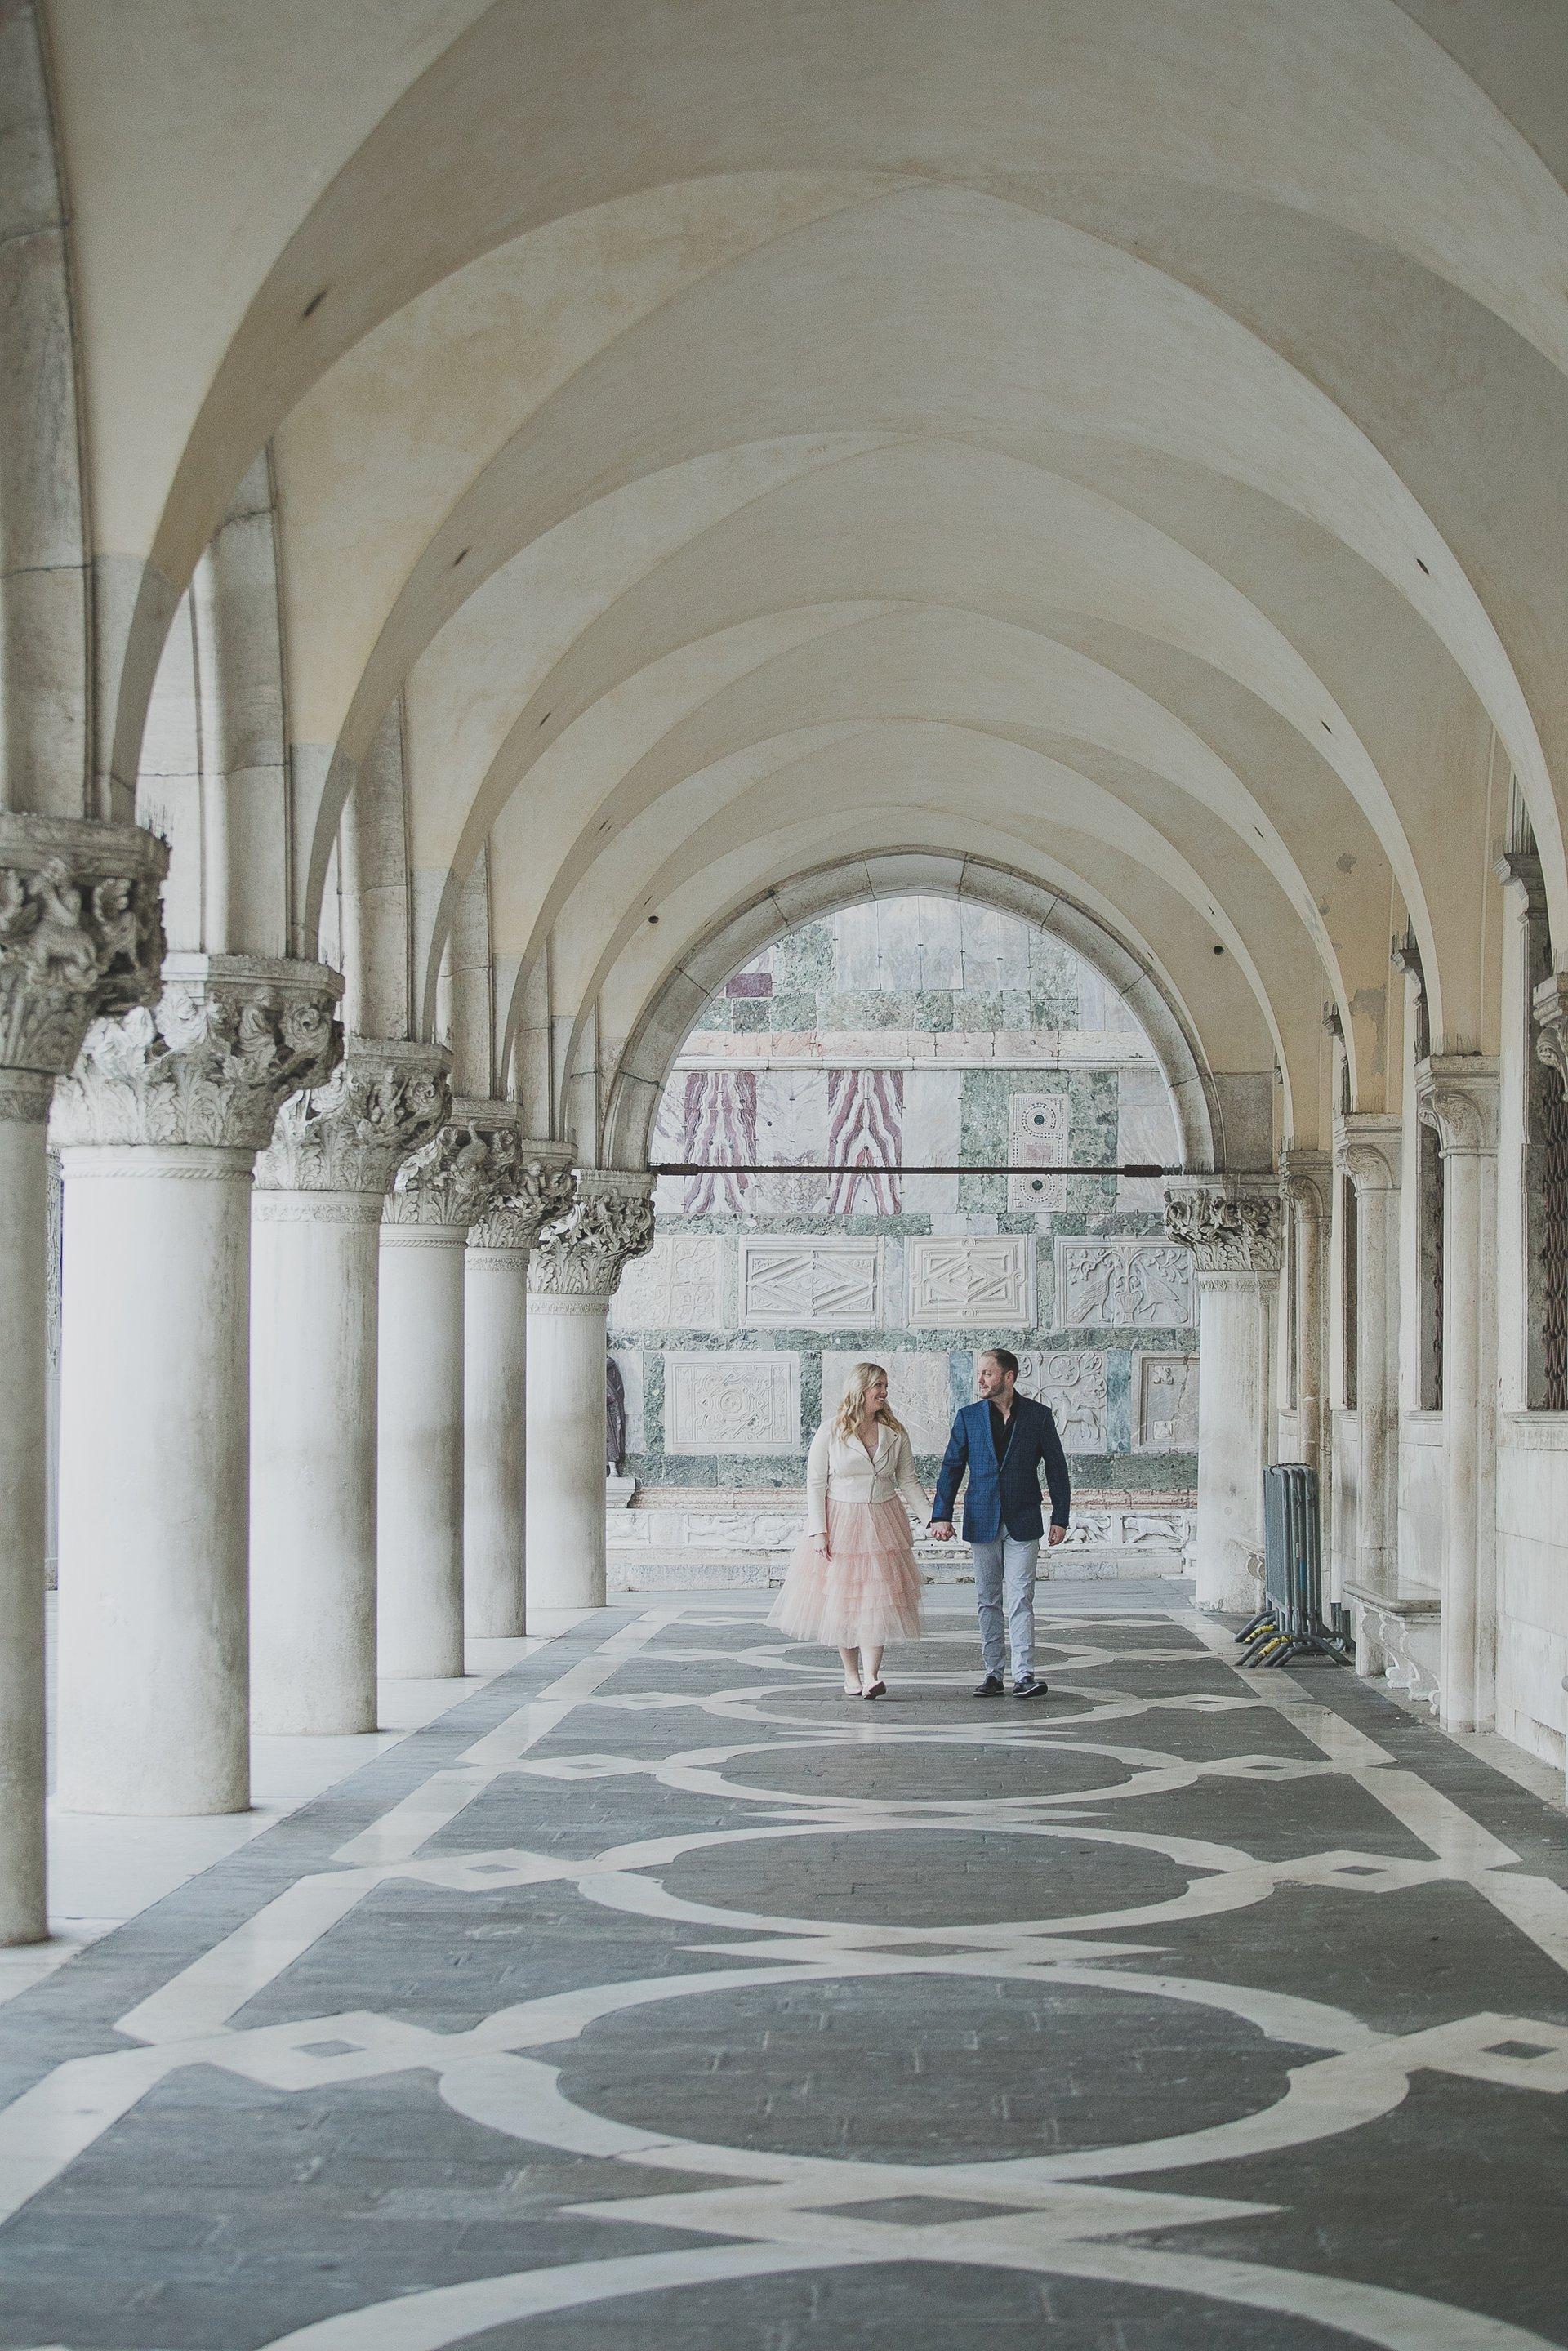 Venice-Italy-travel-story-Flytographer-4